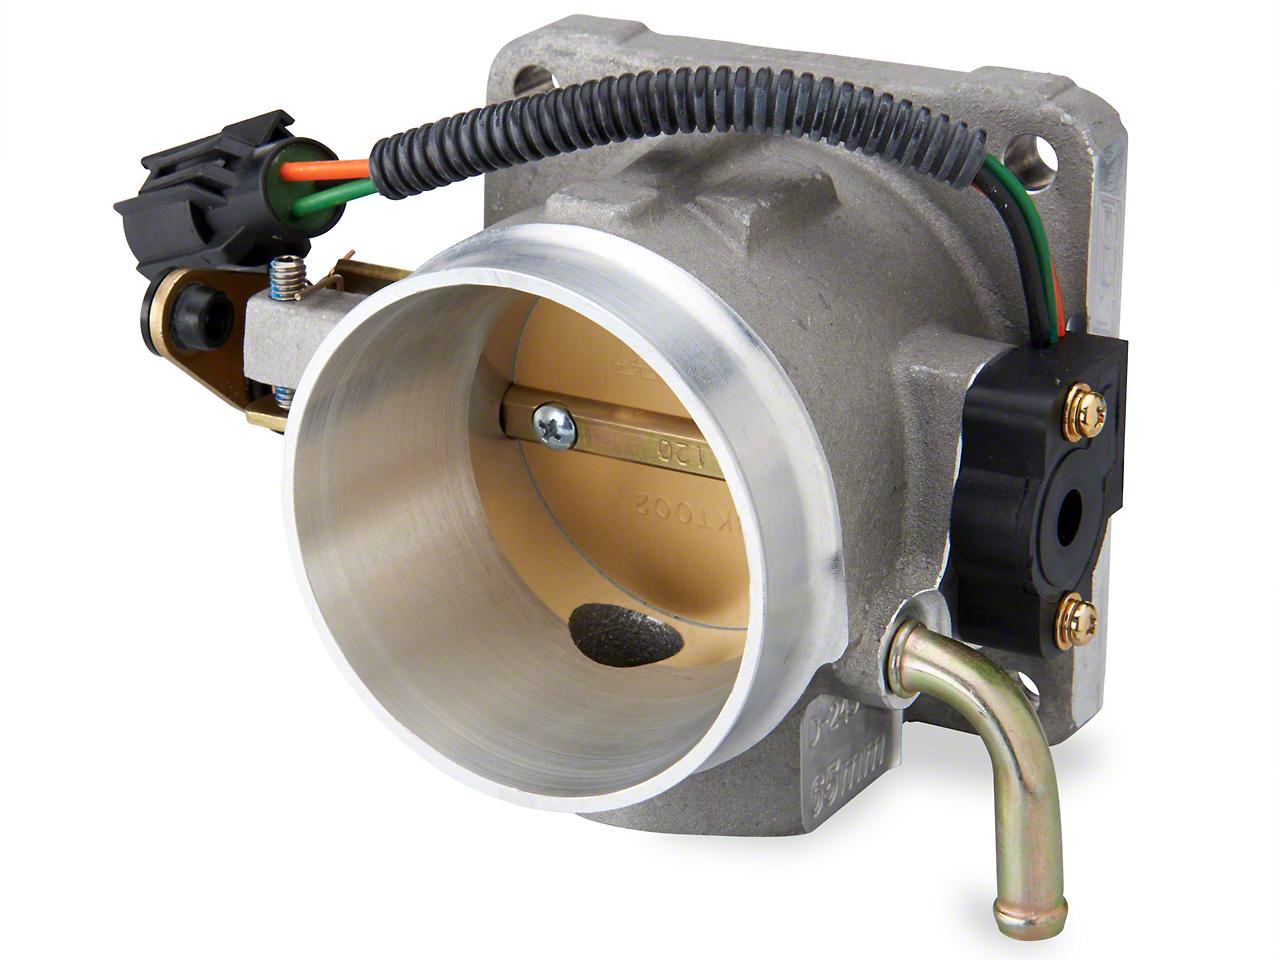 BBK 65mm Throttle Body (86-93 5.0L)